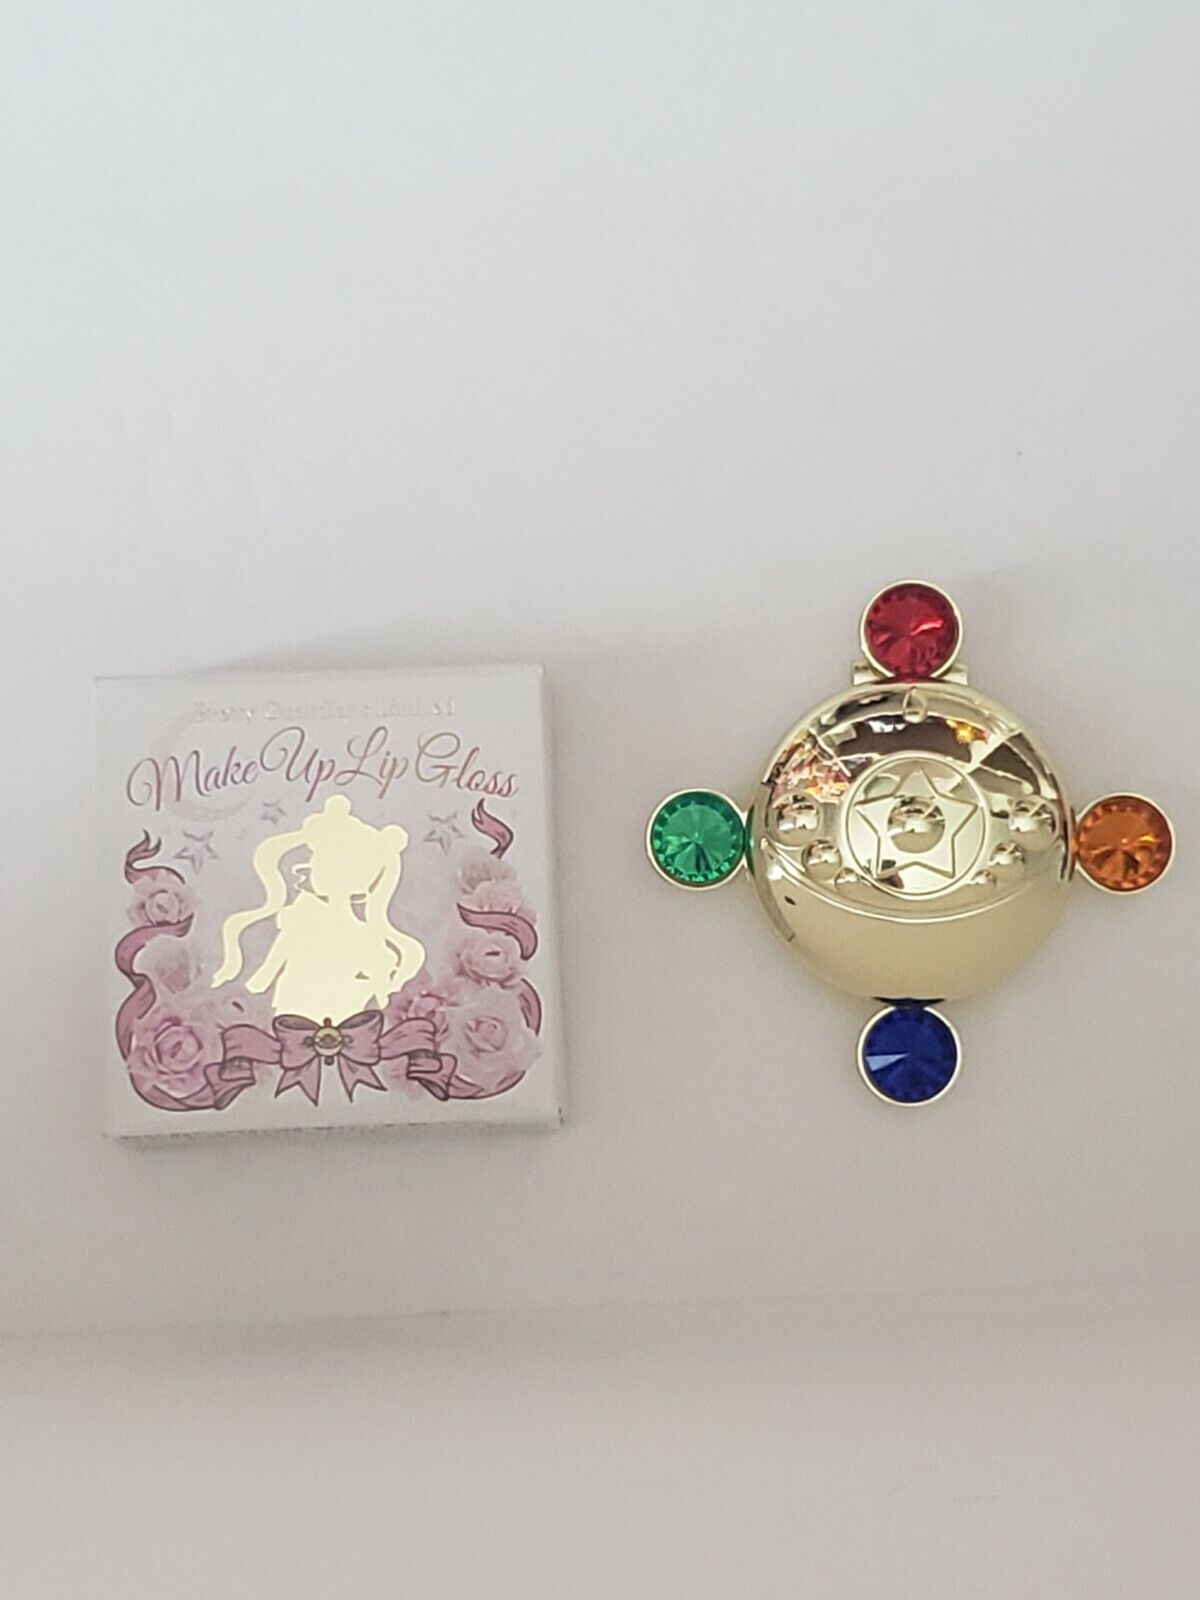 Sailor Moon Pretty Guardians Lip Gloss Official Fan Club Japan Limited Compact